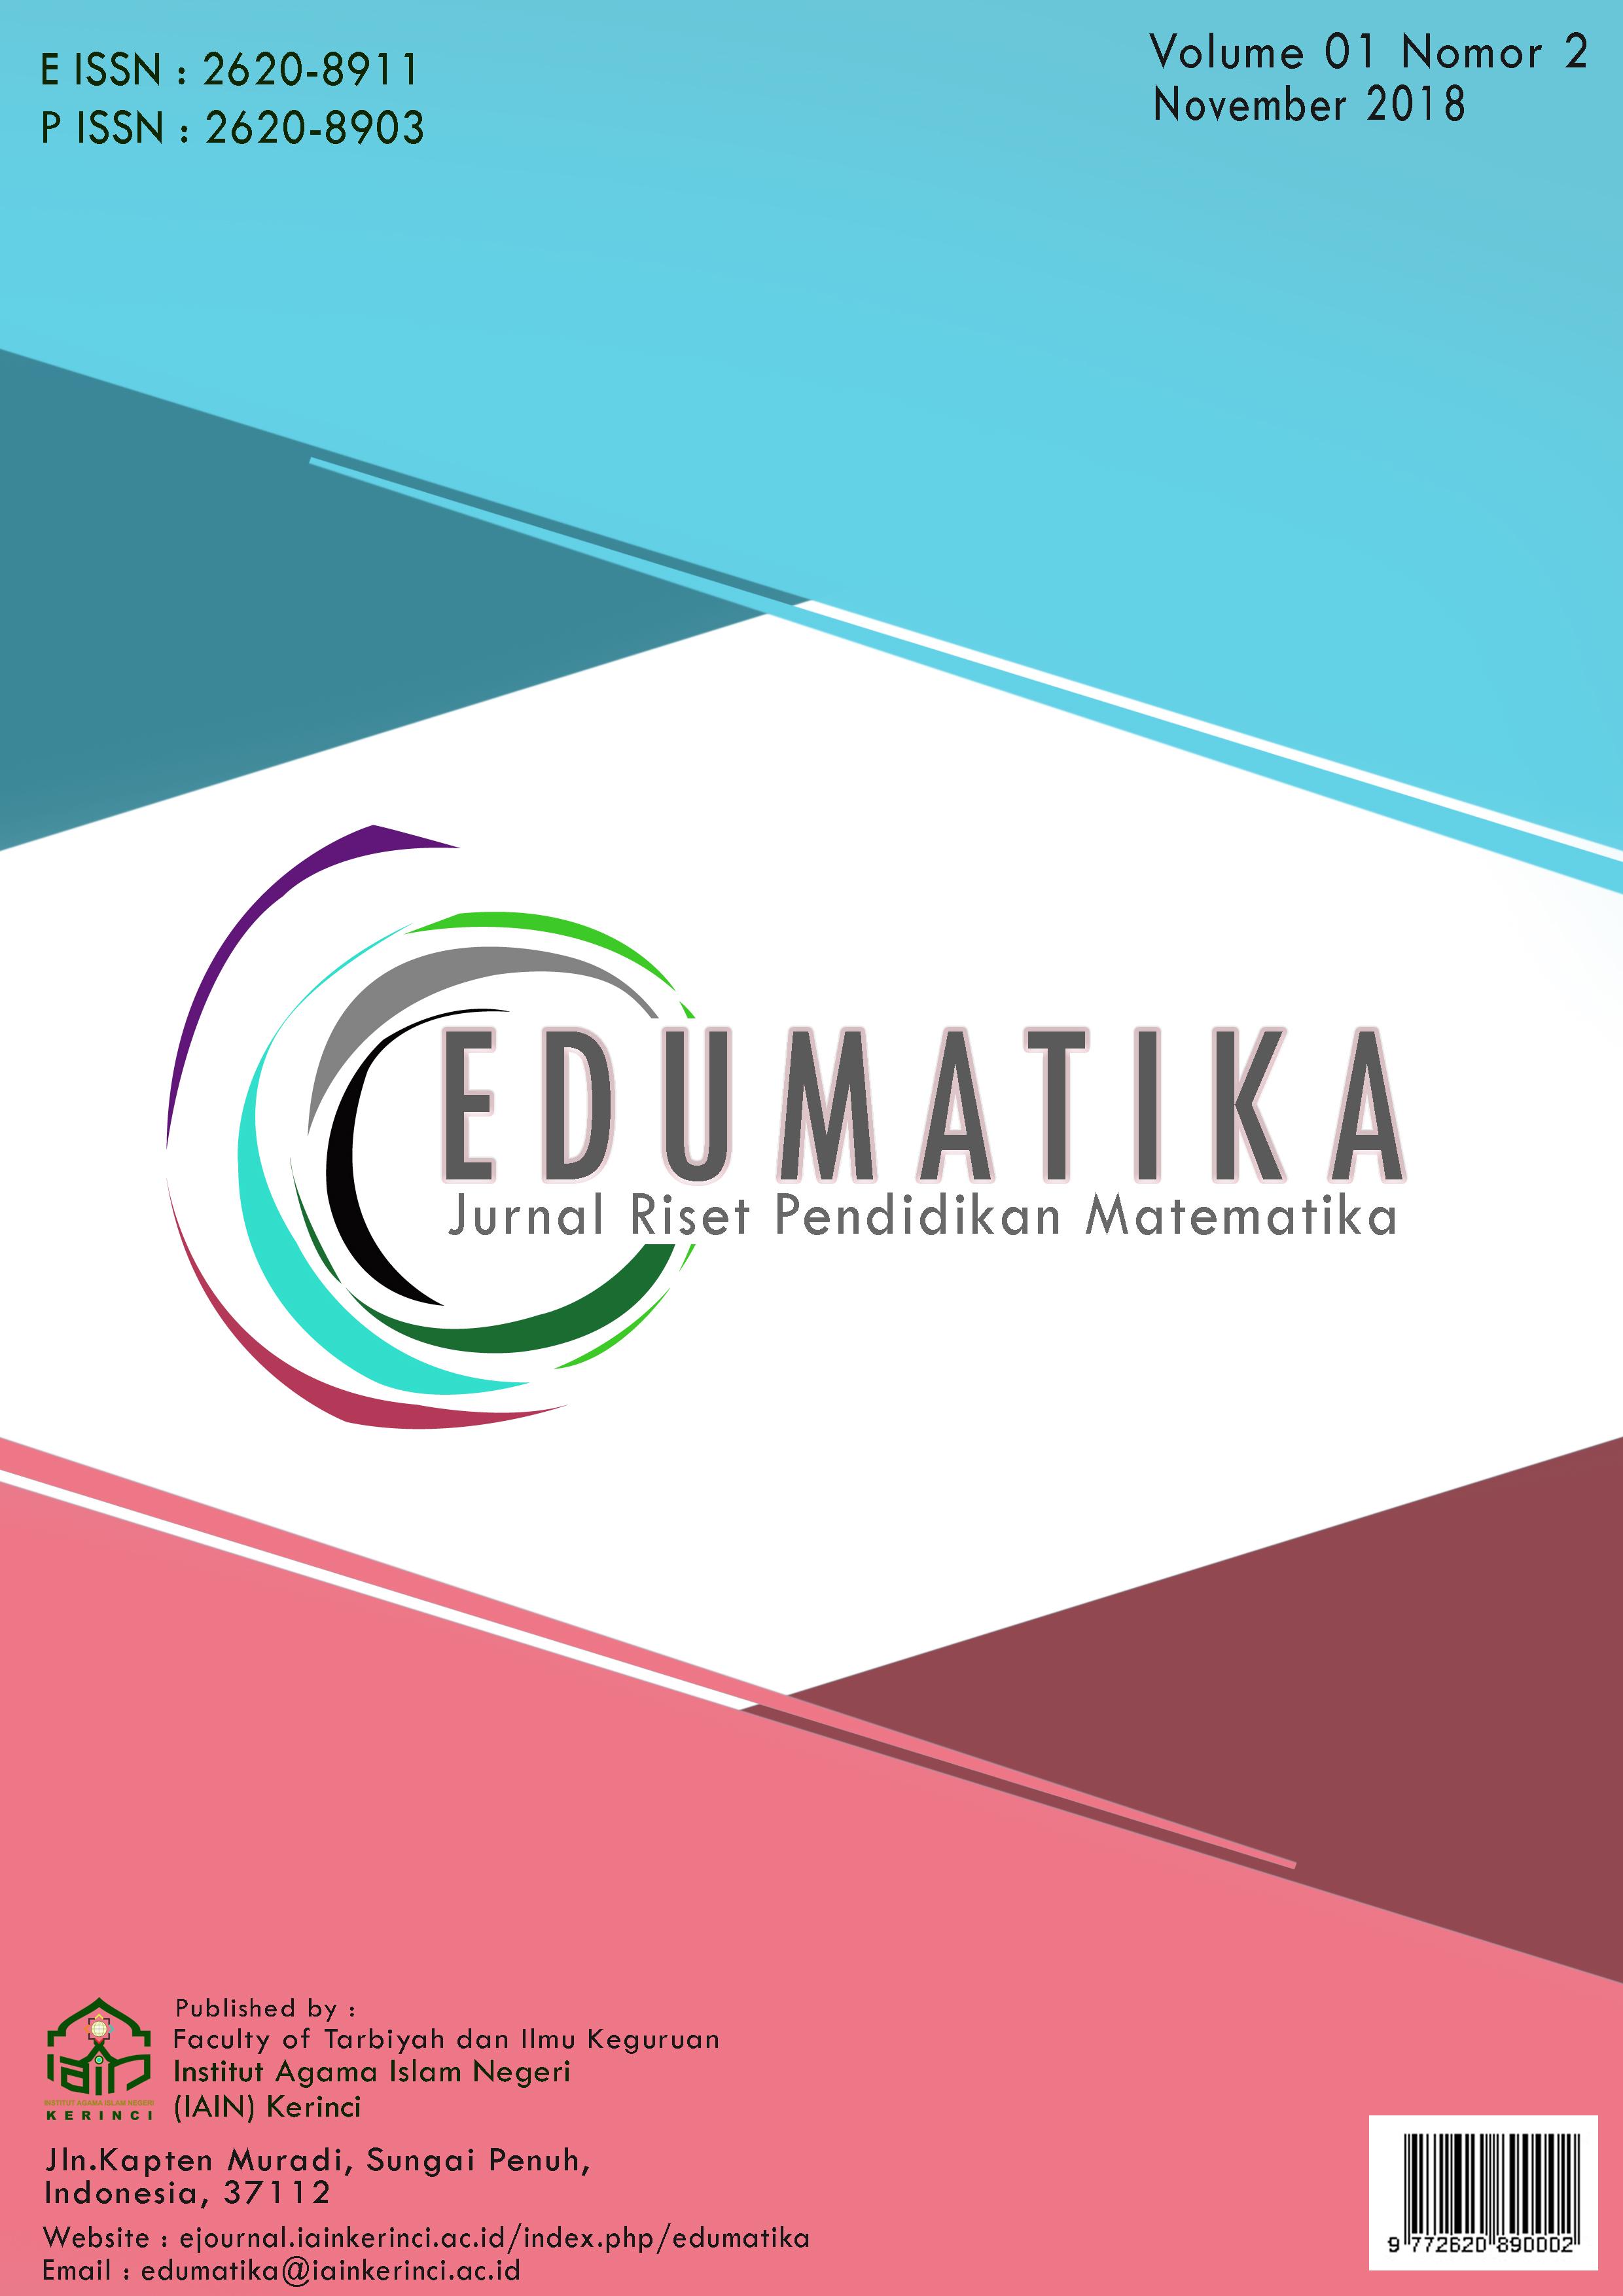 View Vol. 1 No. 2 (2018): November 2018, Edumatika : Jurnal Riset Pendidikan Matematika